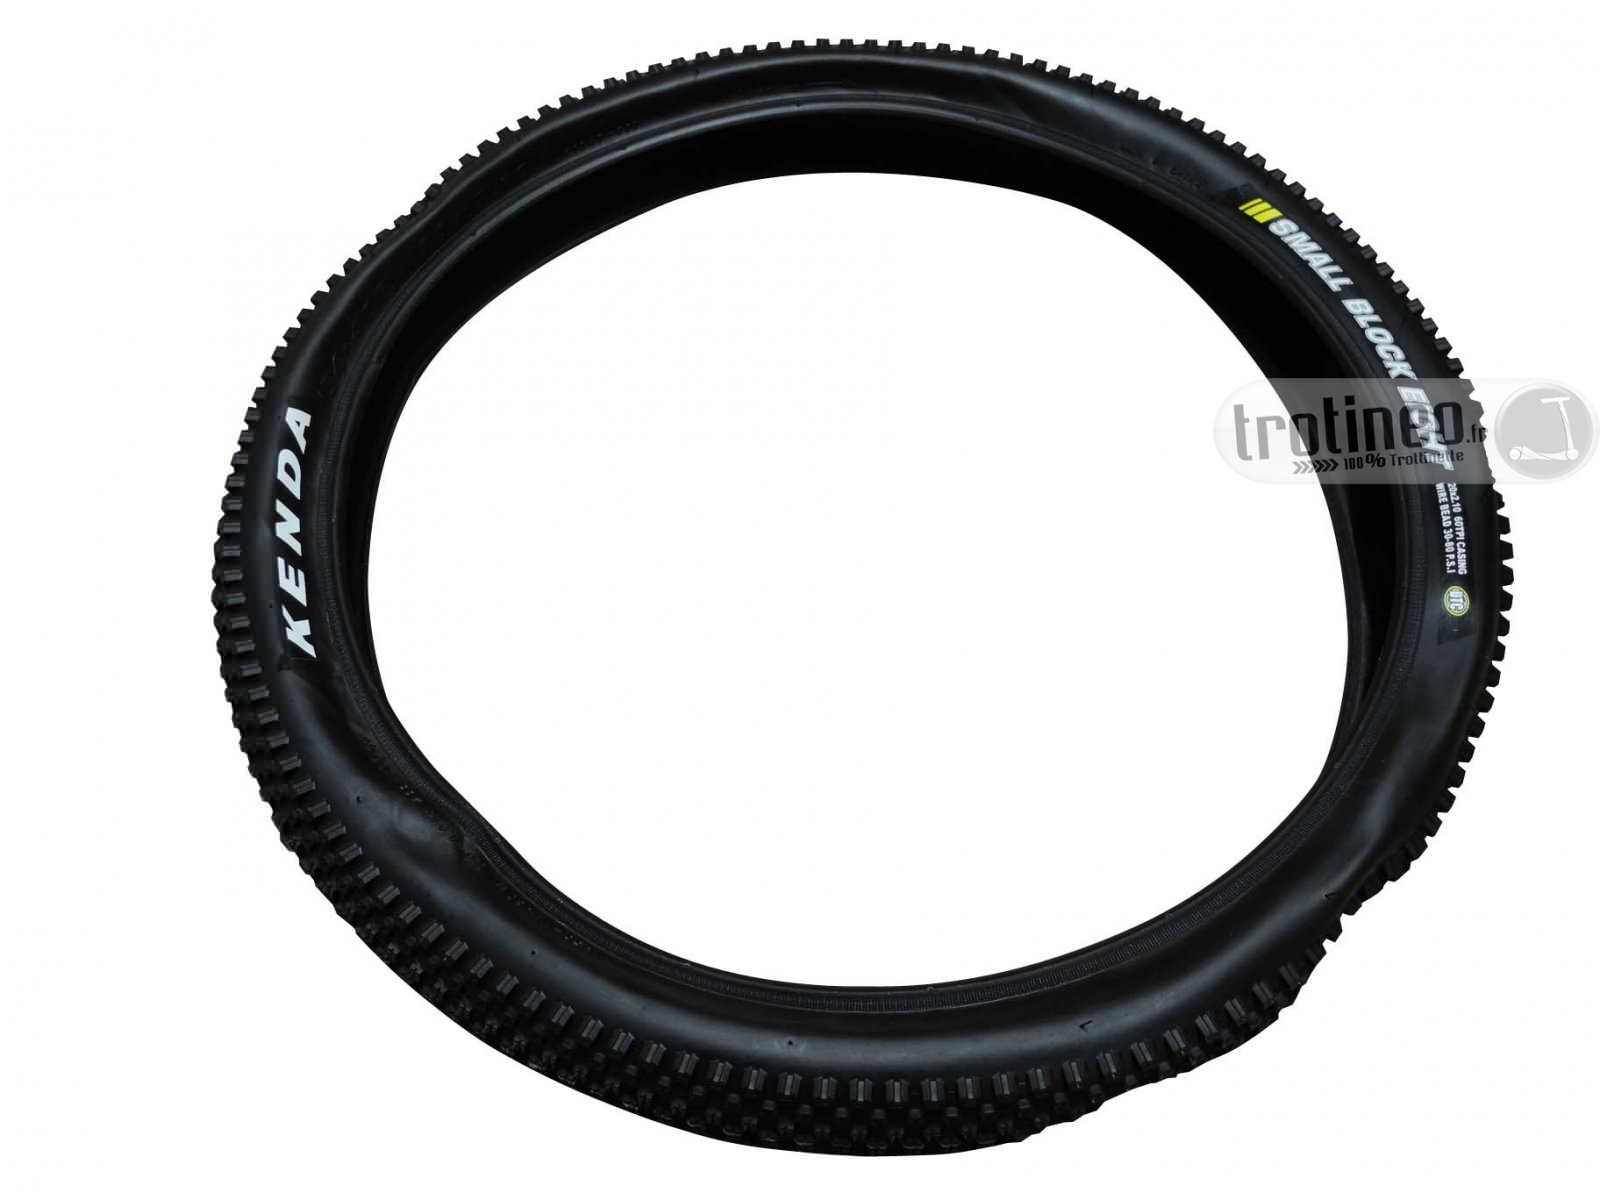 kickbike-pneu Xmax 20